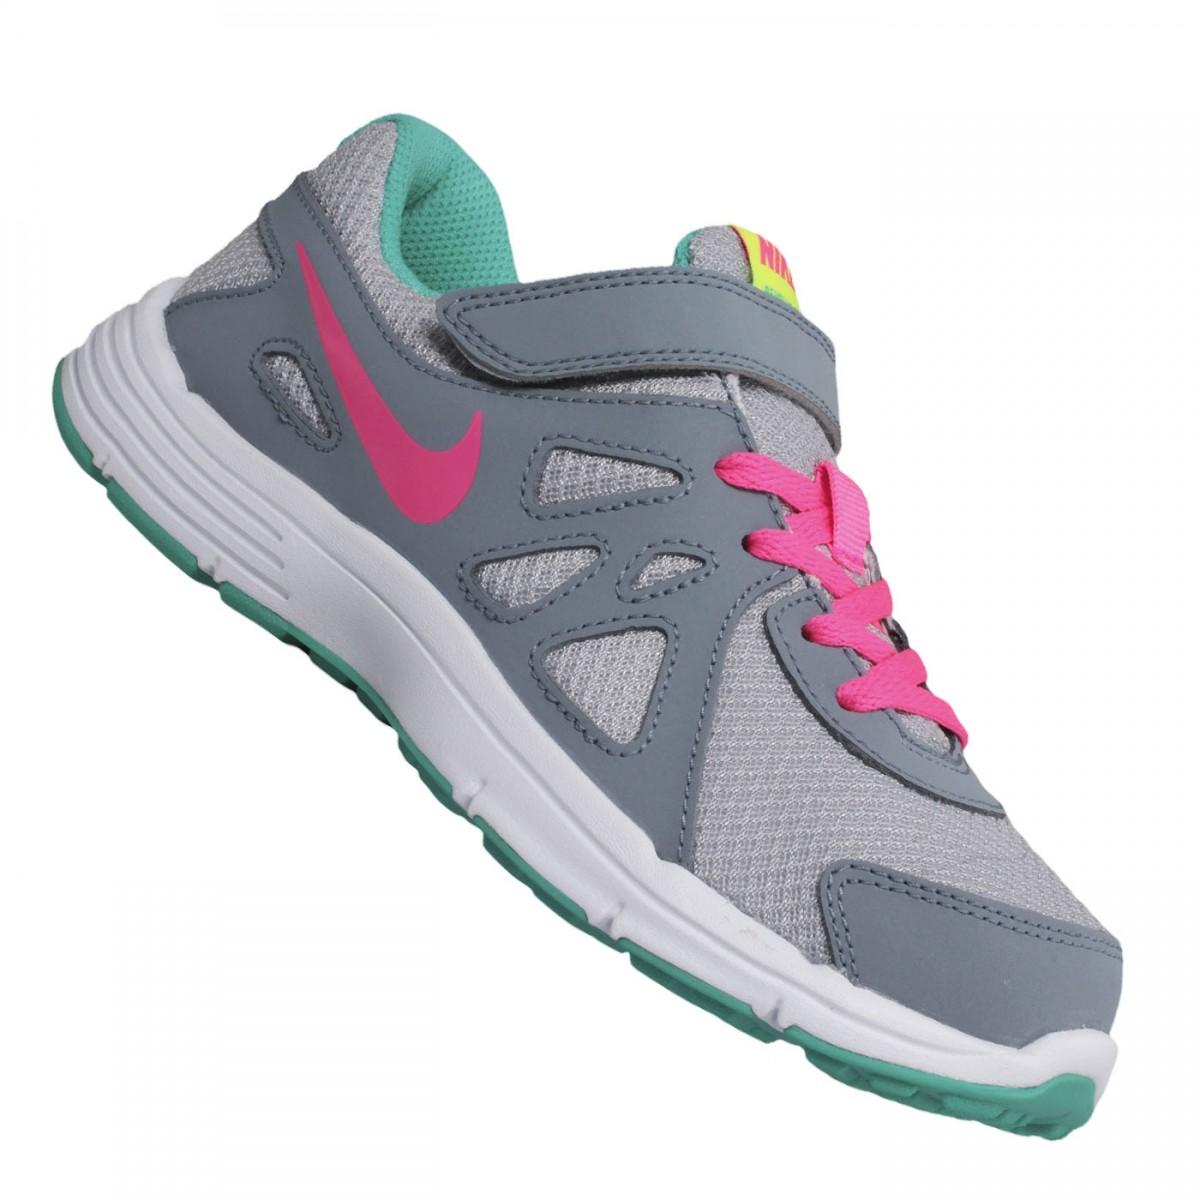 74a7baee6c560 Tênis Nike Revolution 2 PSV - Feminino